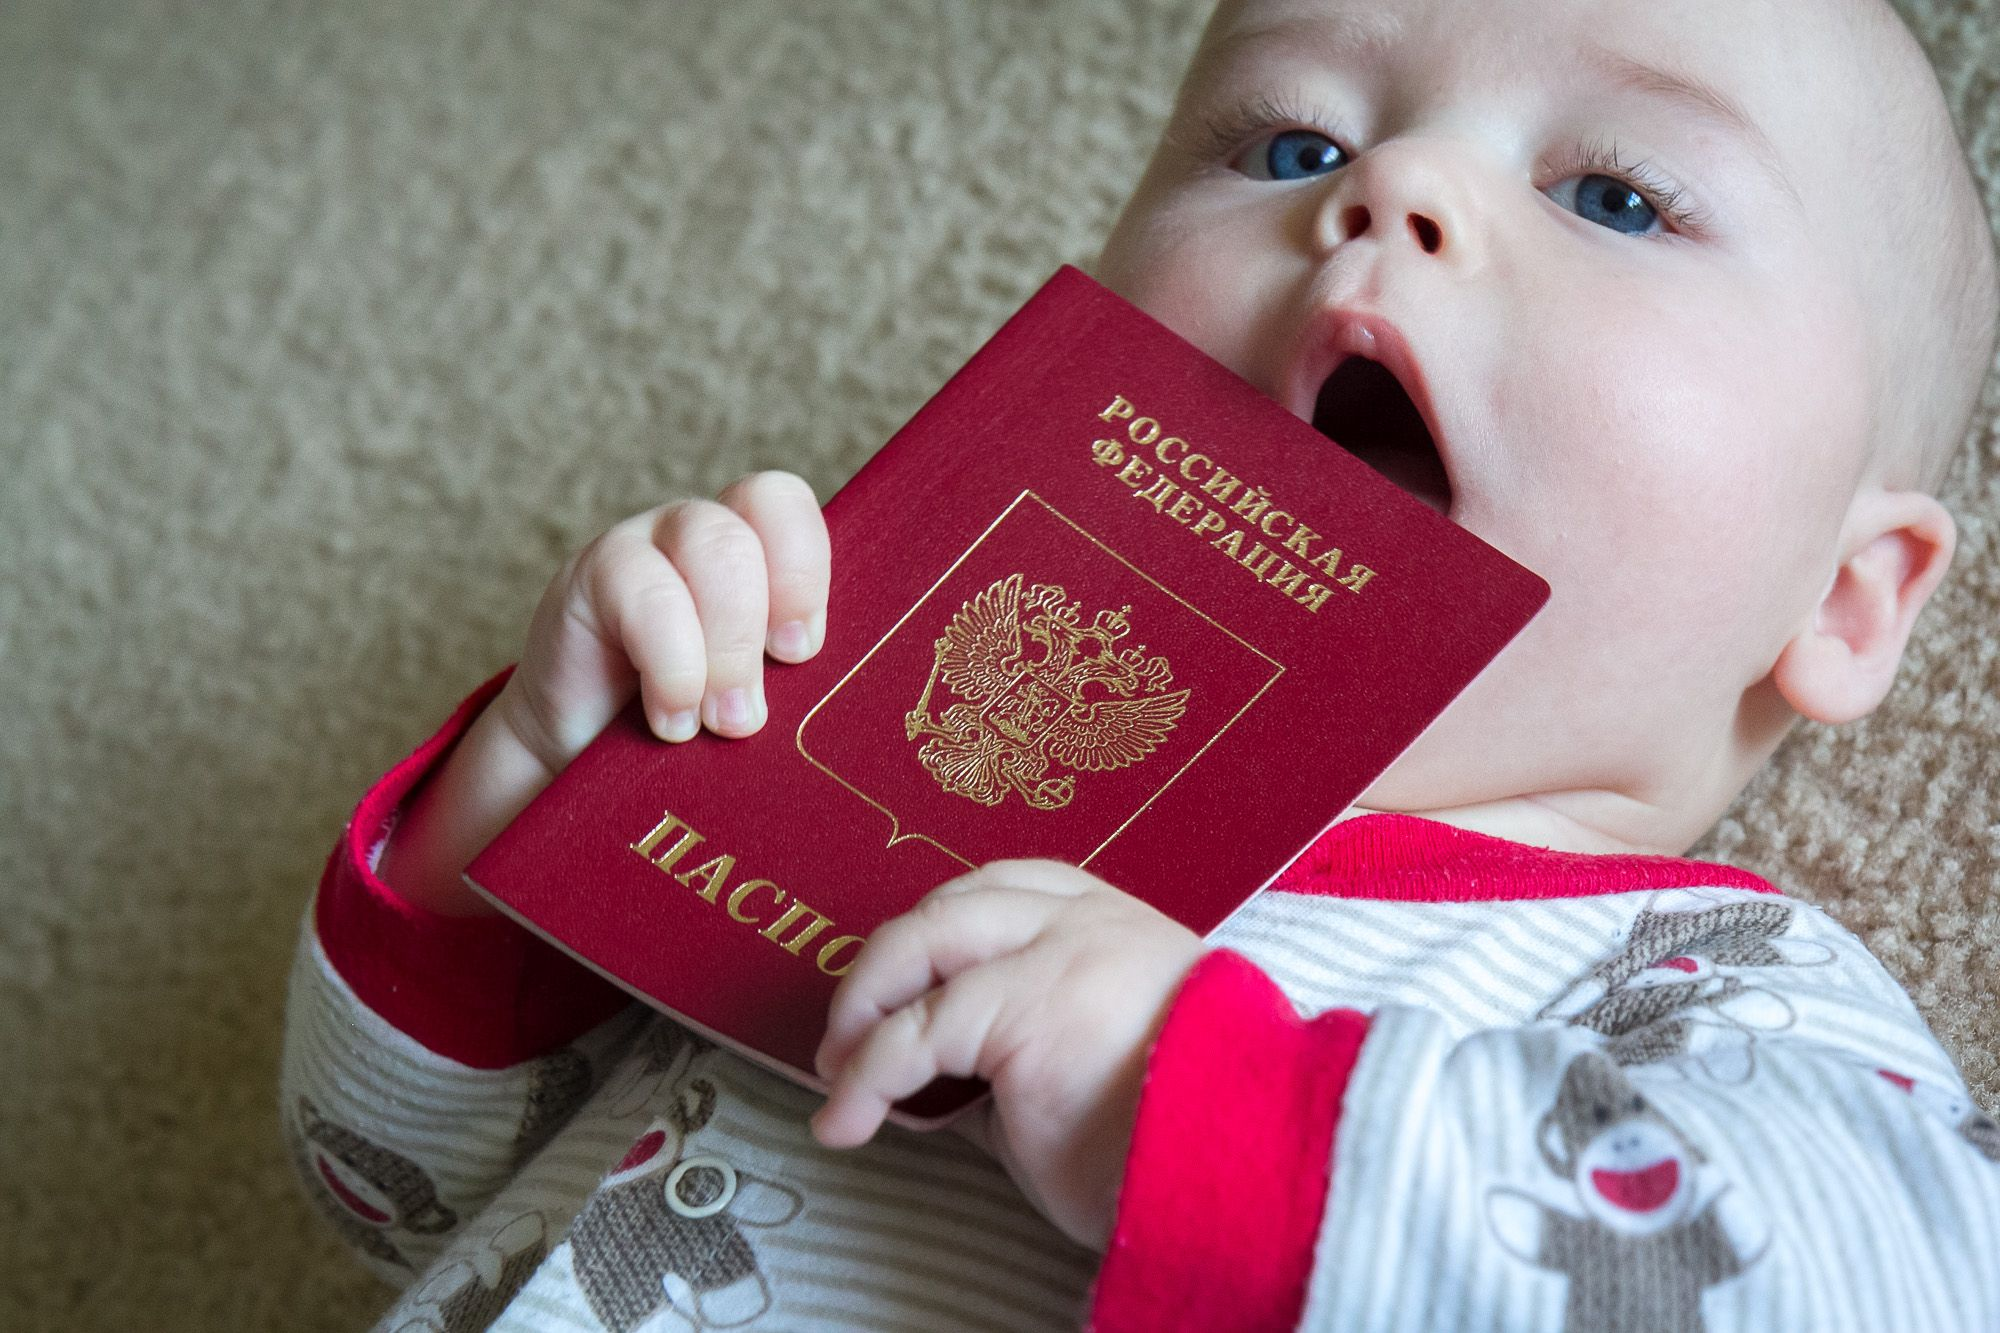 Регистрация ребенка по месту проживания в МФЦ